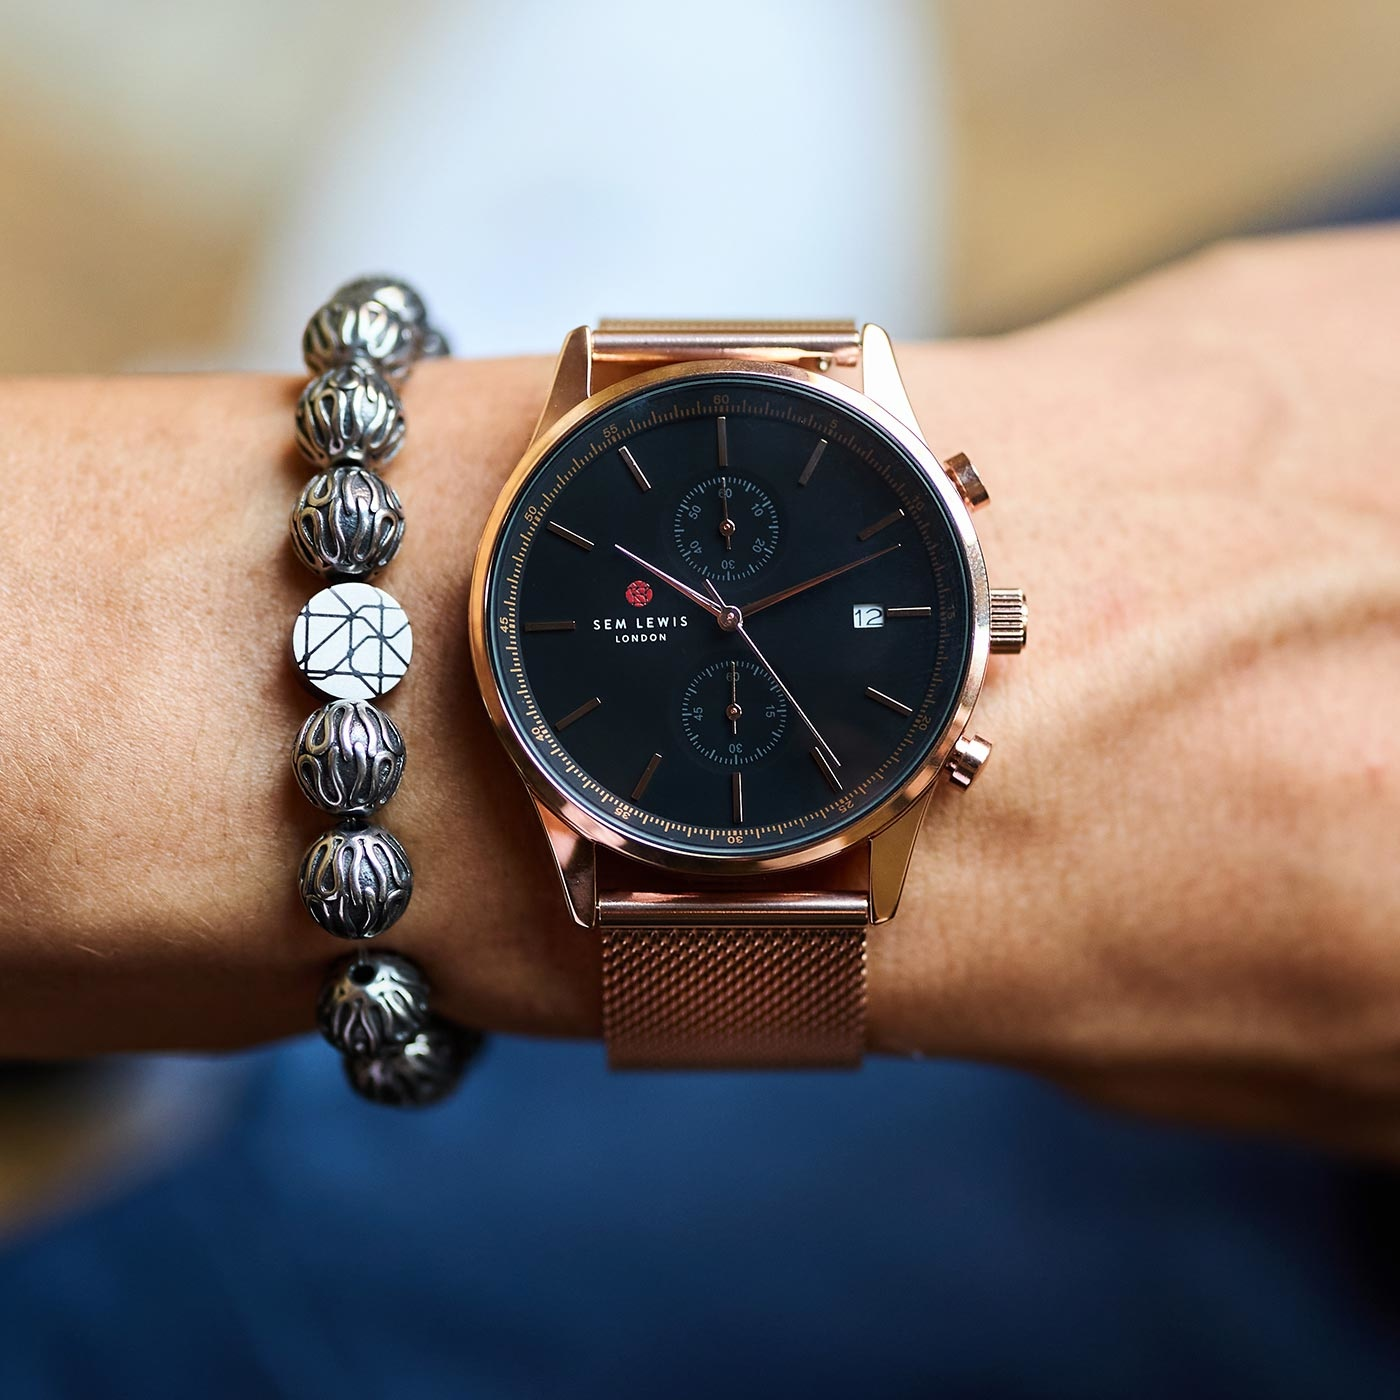 Sem Lewis Piccadilly South Kensington braccialetto di perline color argento